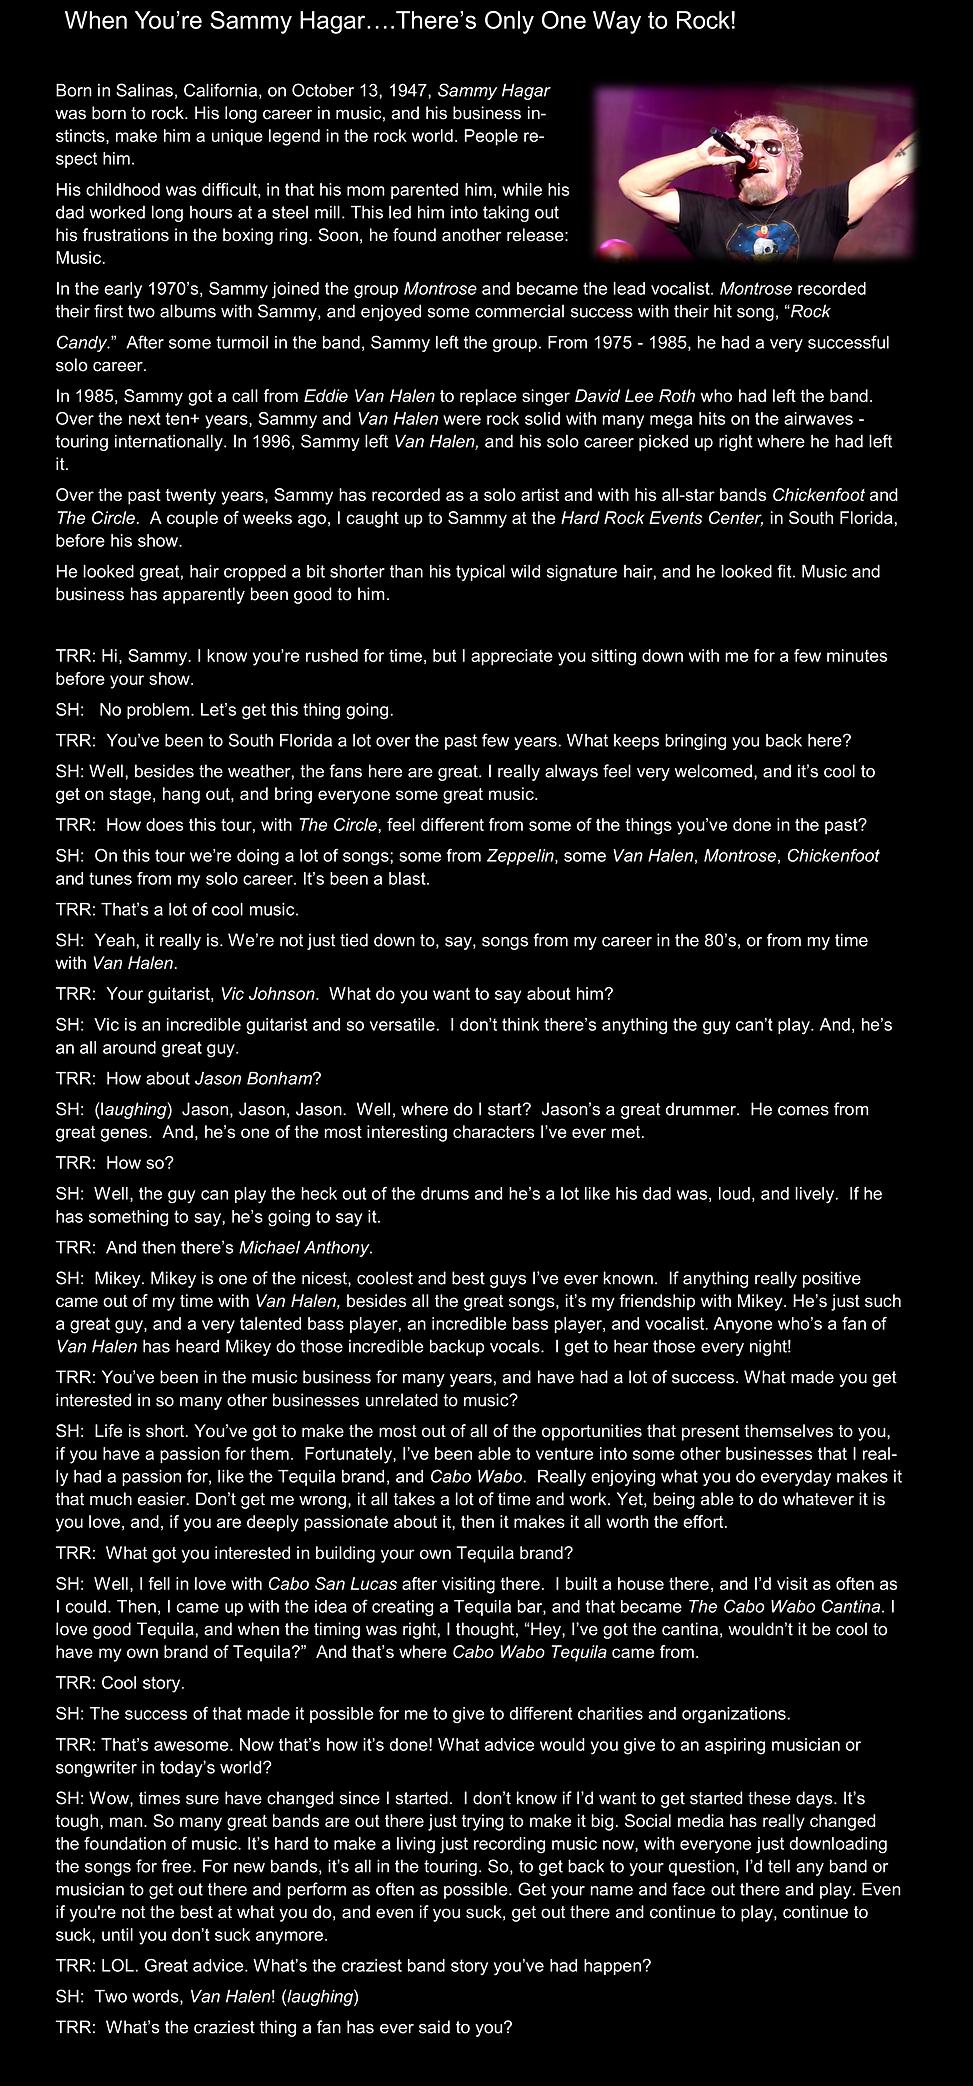 Sammy Hagar - VERY  FINAL Page 1.png